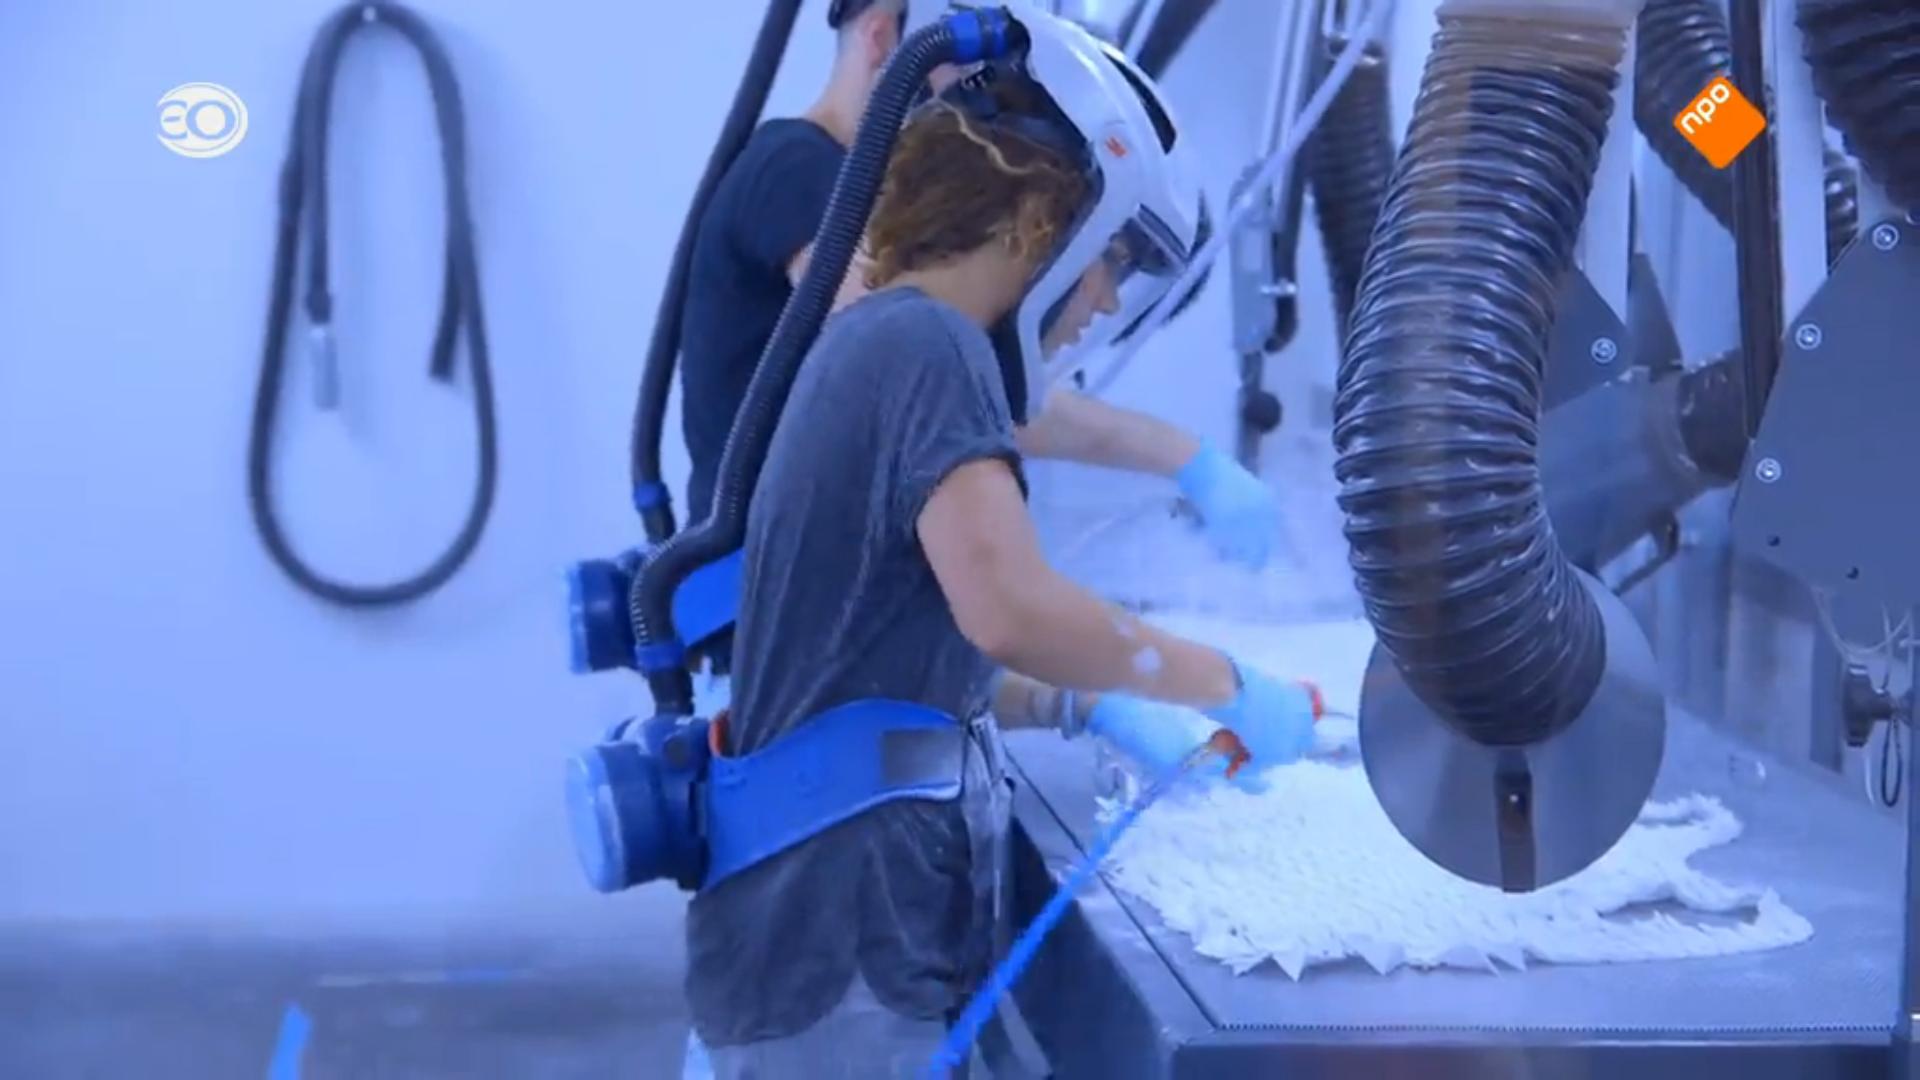 depowdering a Kinematics dress at Shapeways